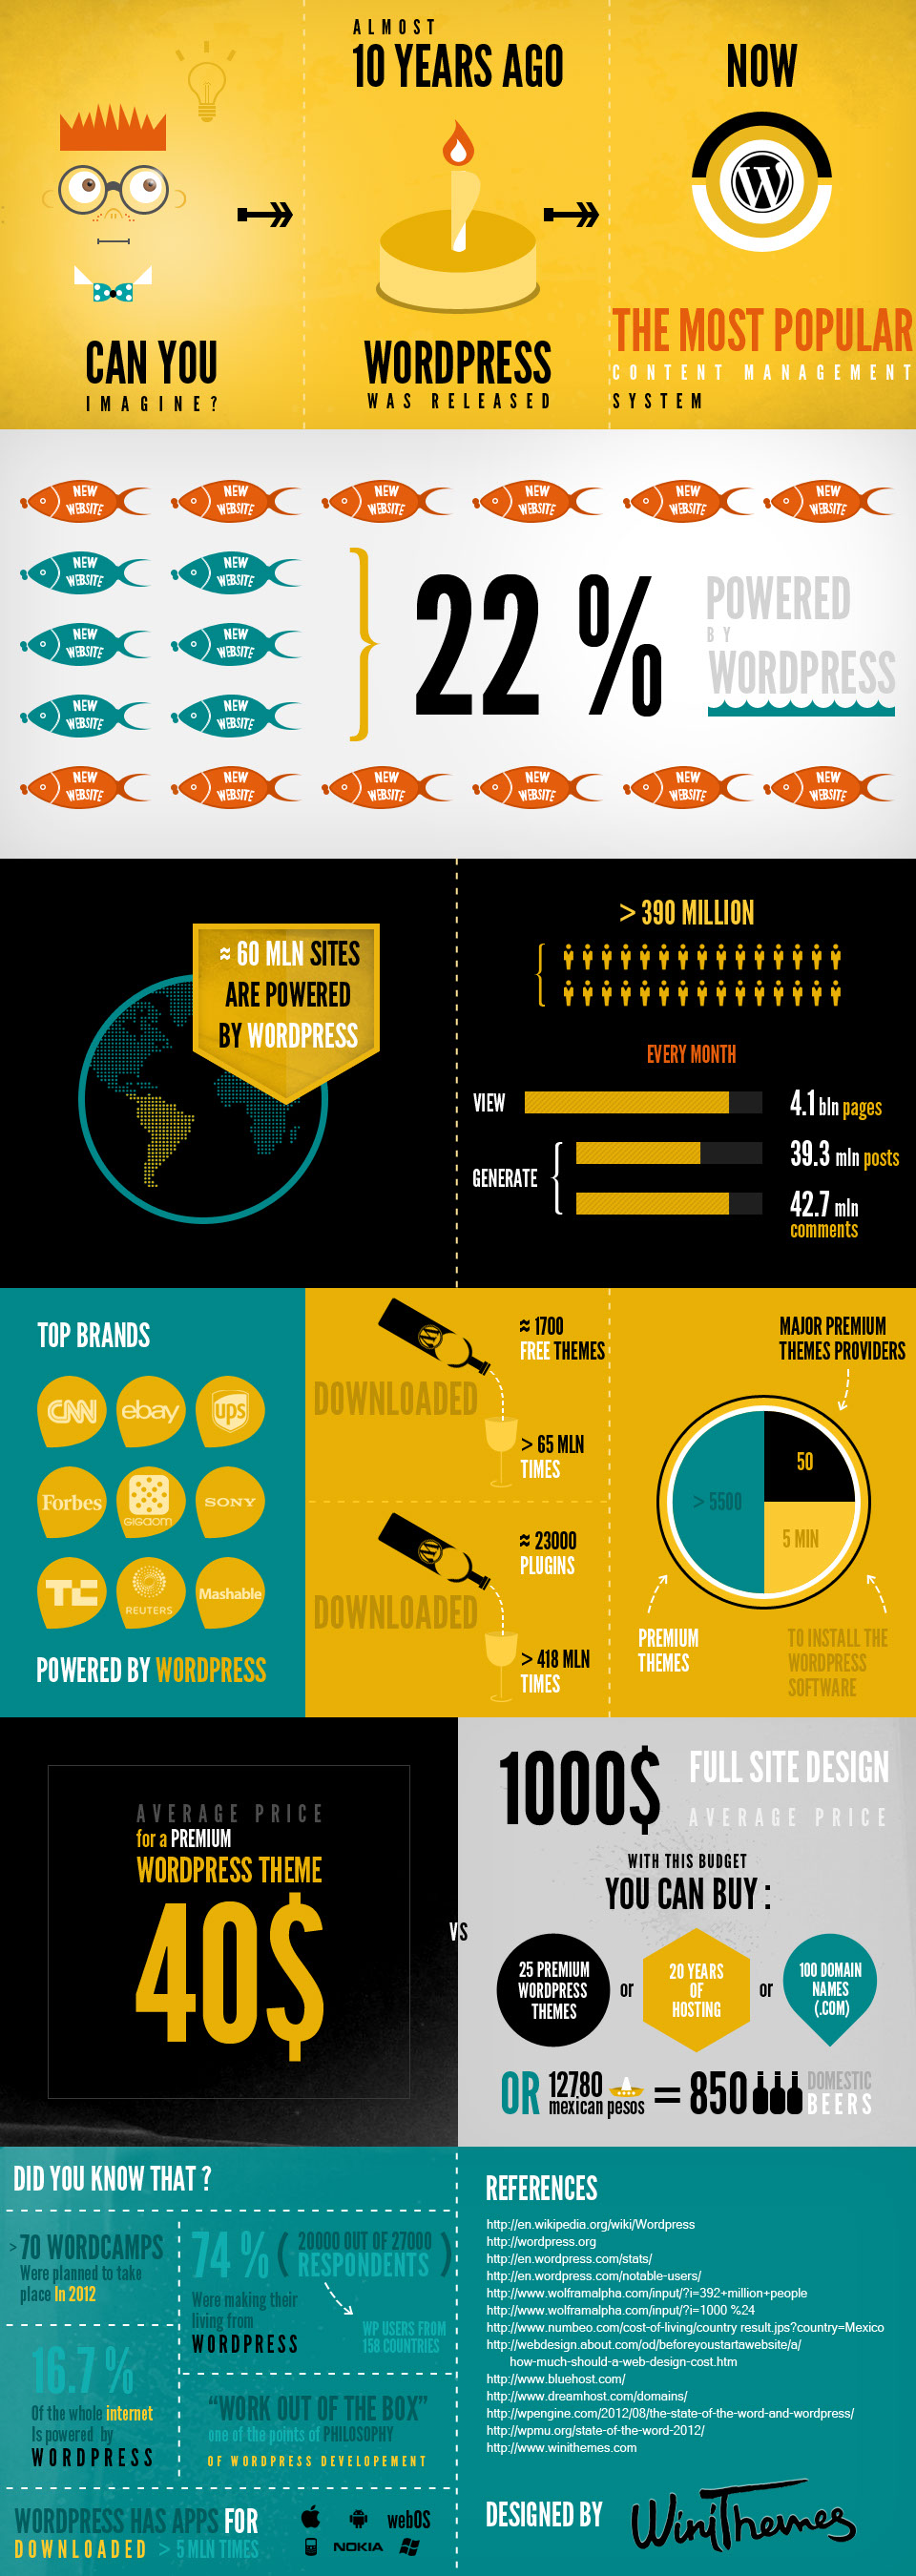 Wordpress Popularity 2012-Infographic